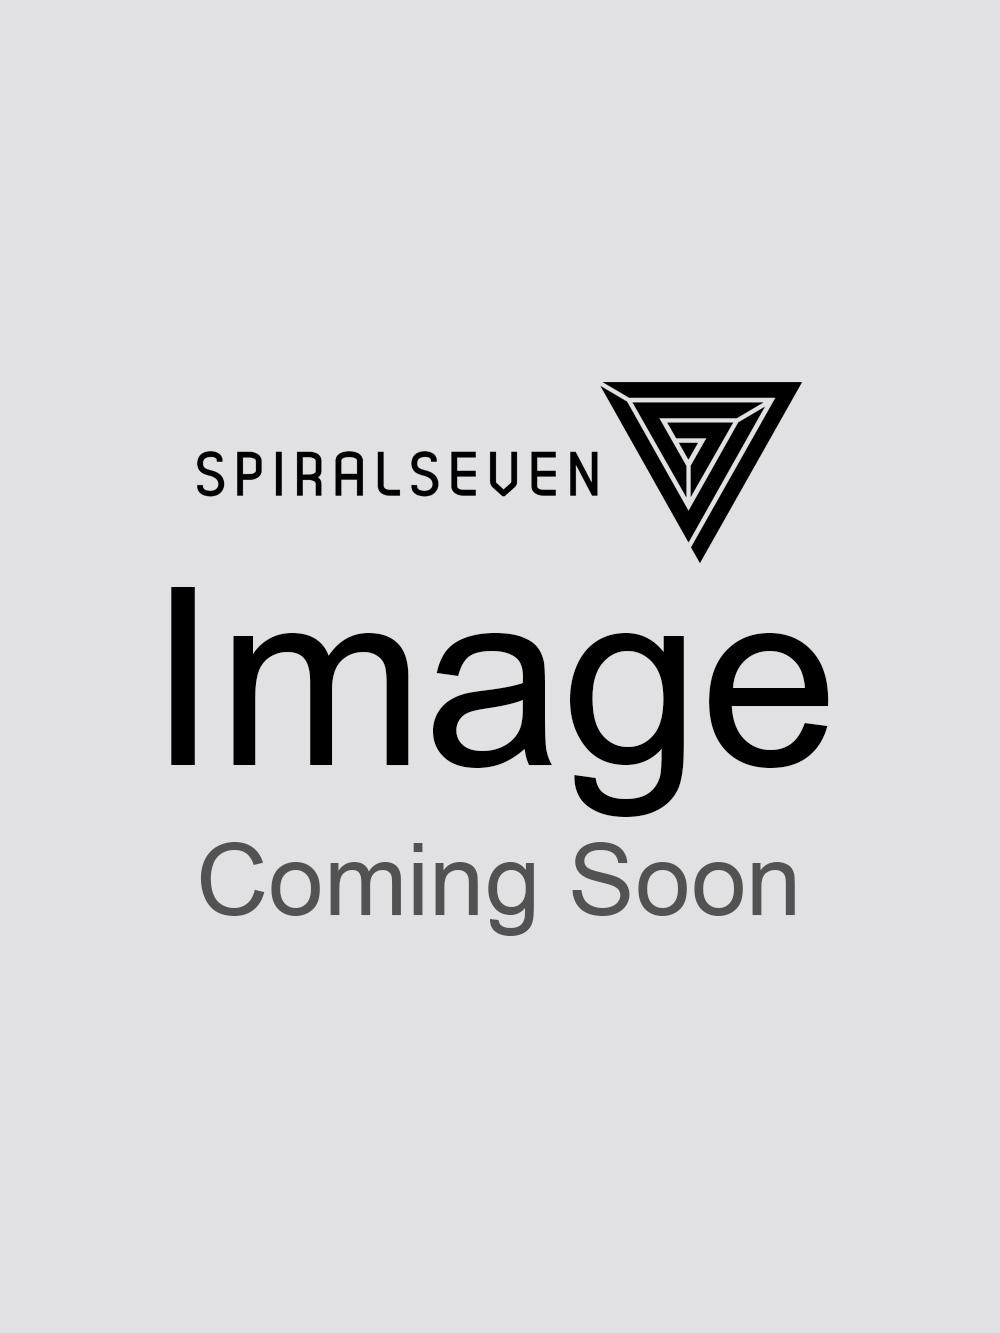 f6a687b1bb59 Nimes Pinstripe T-Shirt Black | Spiral Seven - Designer Clothing